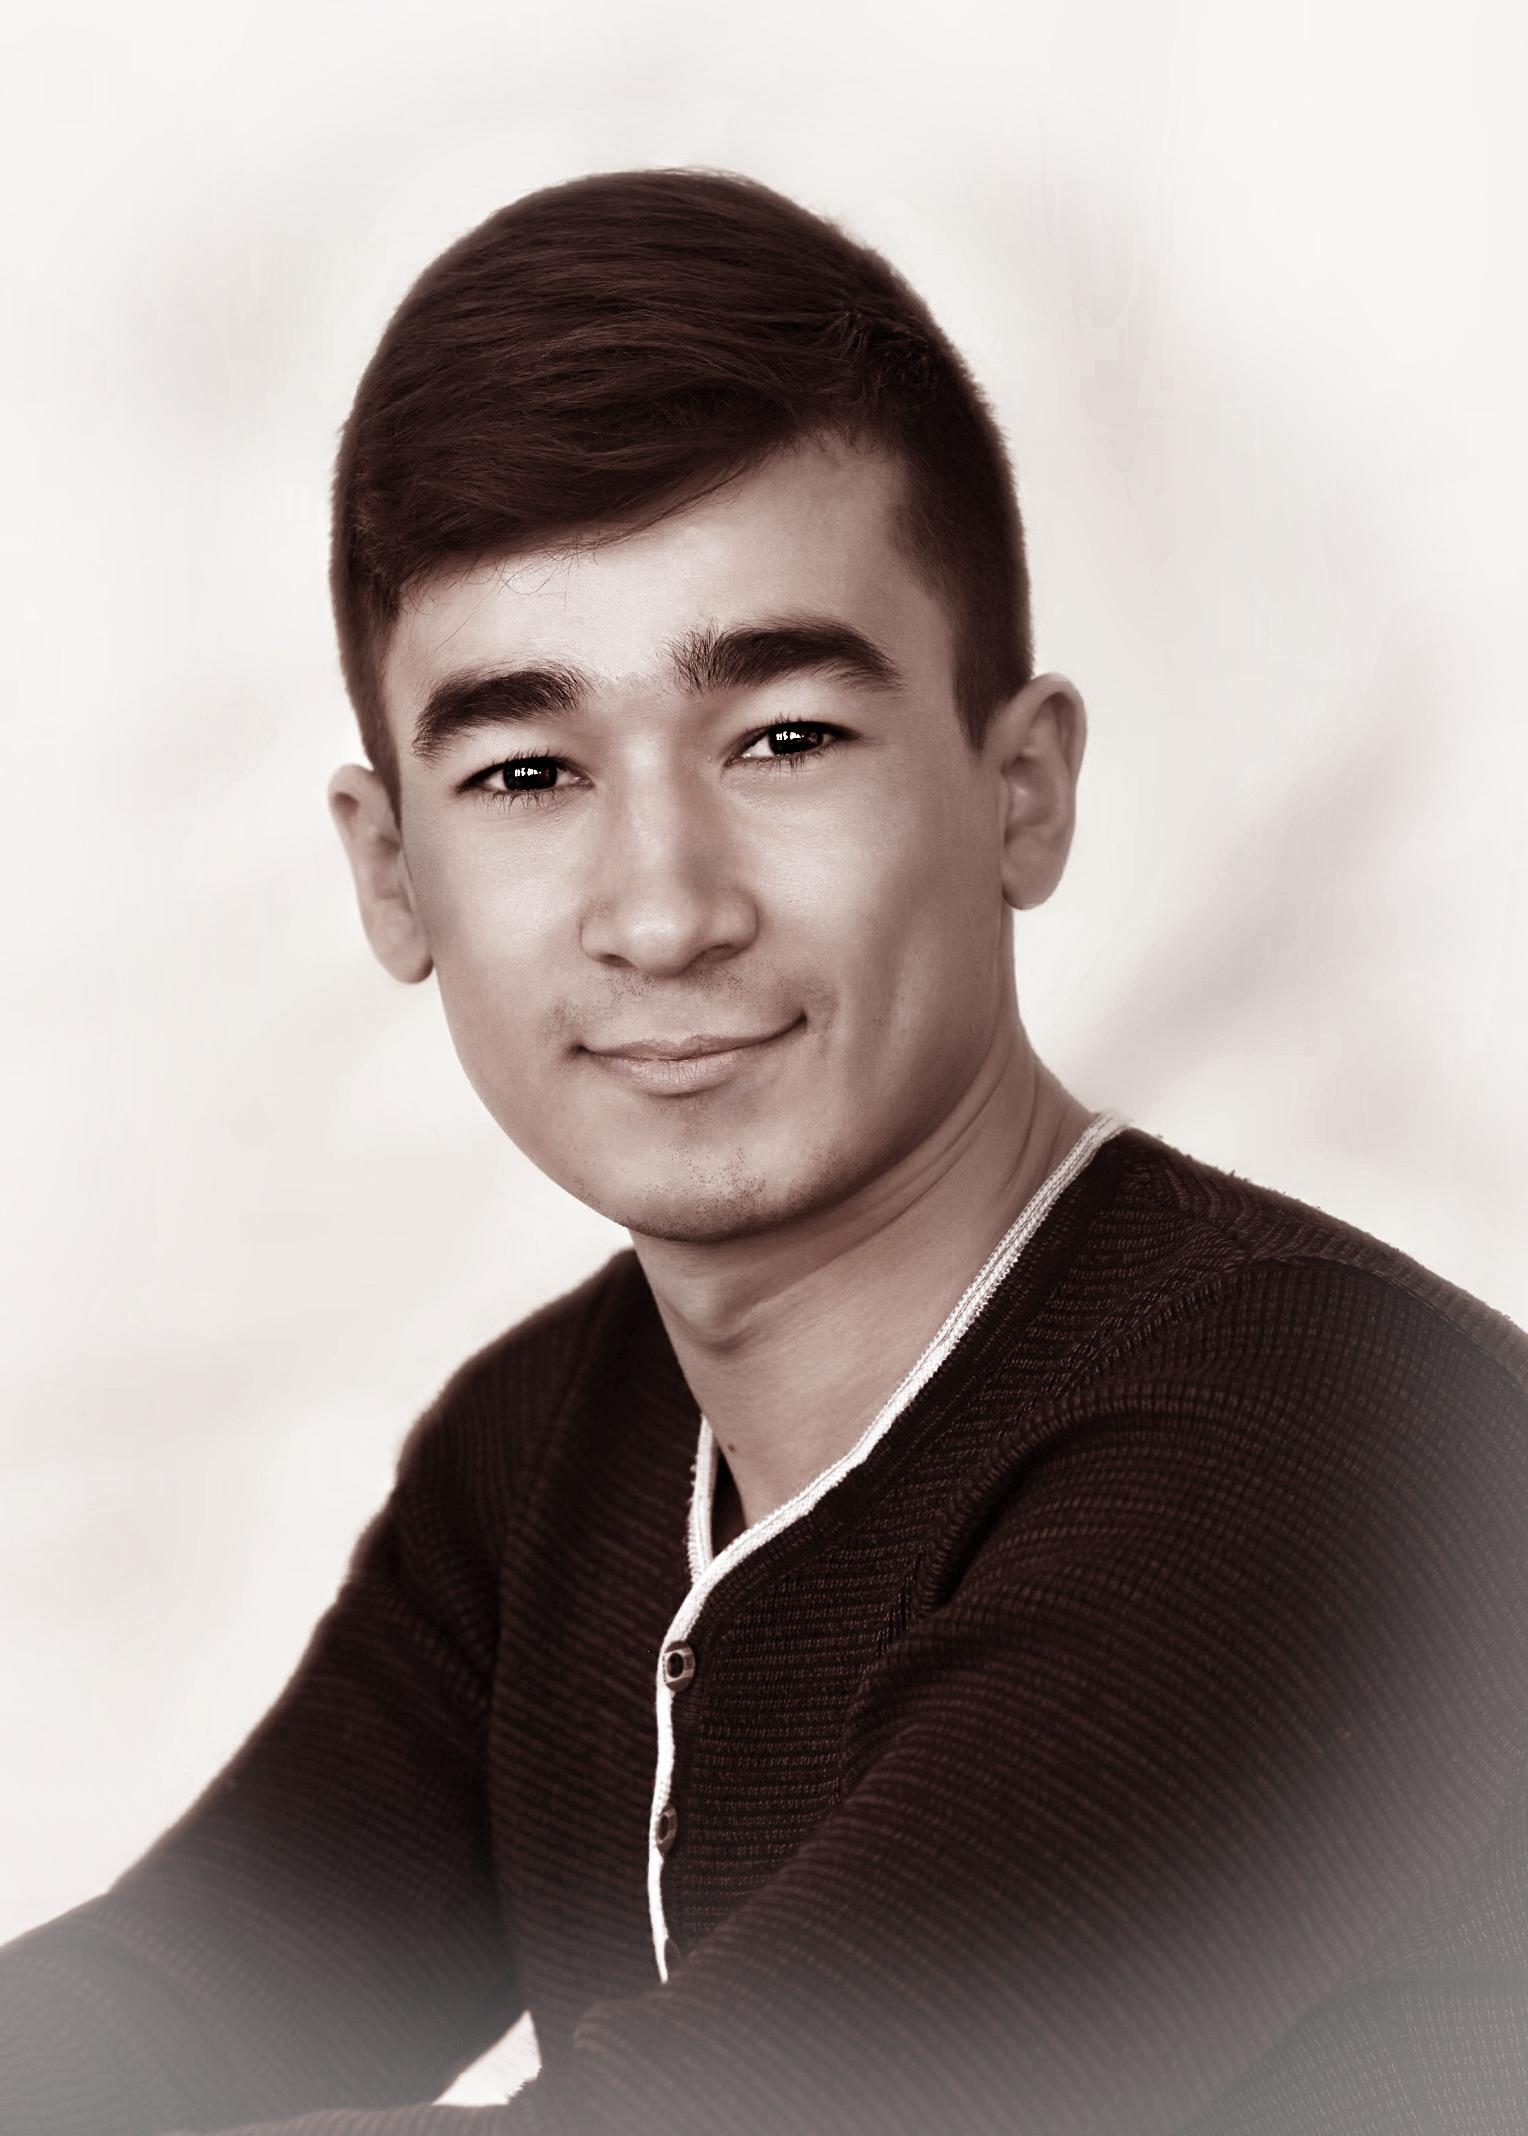 Пурювкин Валерий Сергеевич